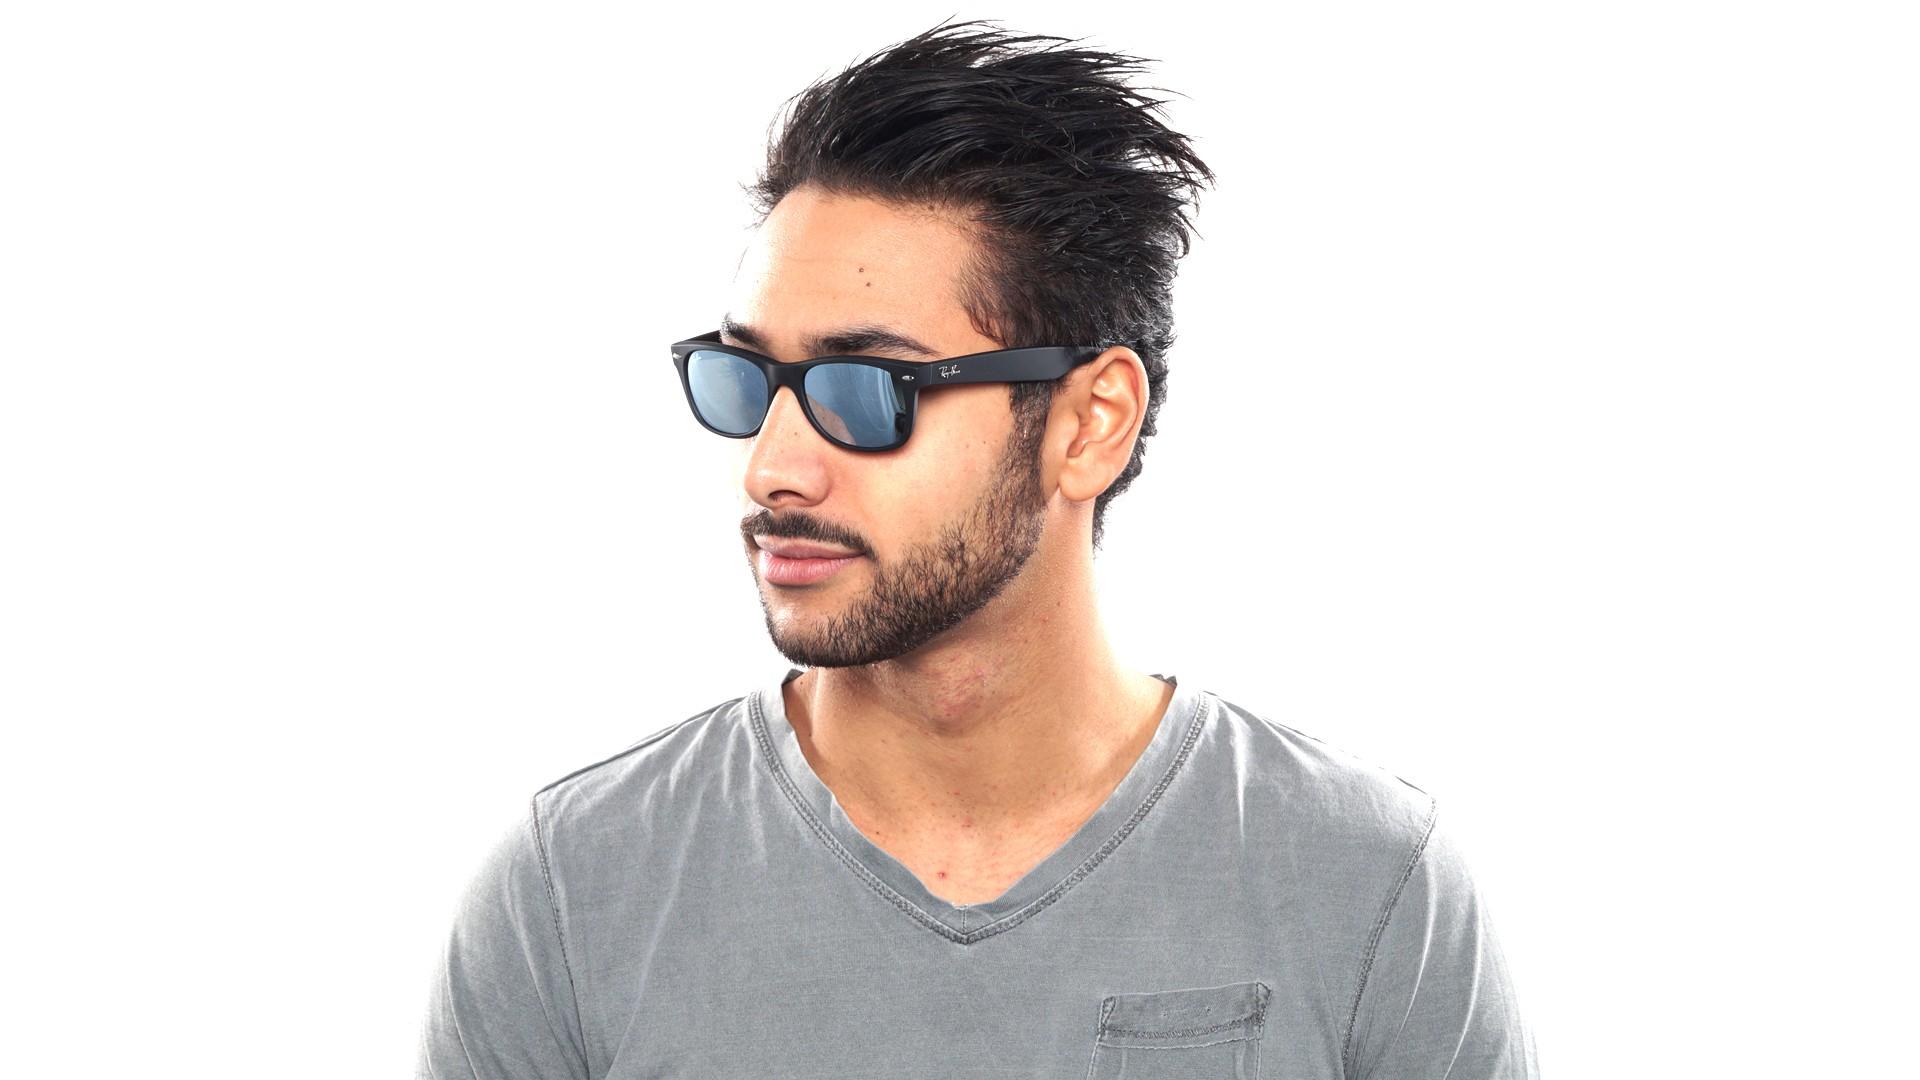 dab426dde7a ray ban new wayfarer rb2132 622 ray-ban new wayfarer sunglasses black